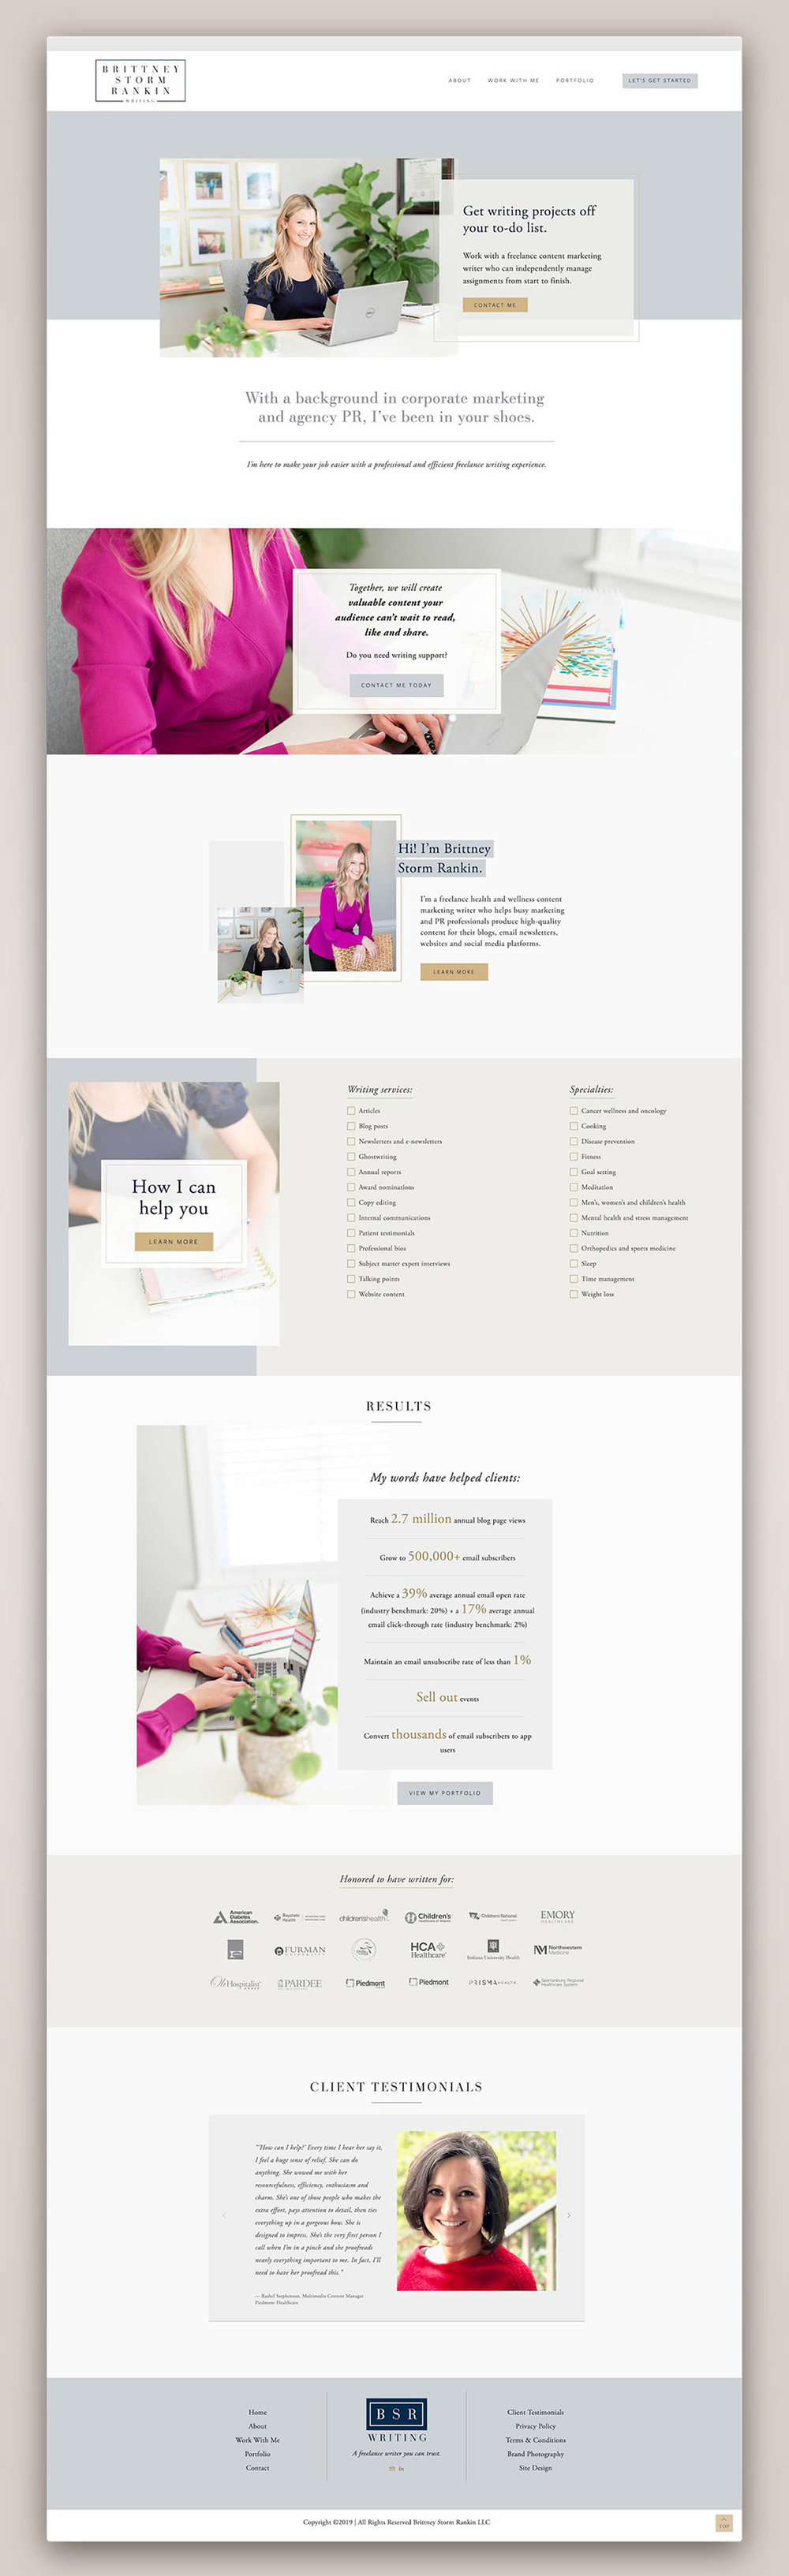 Brittney Storm Rankin Writing Home page | Squarespace web design by Jodi Neufeld Design #squarespace #writerwebsite #webdesign #feminine